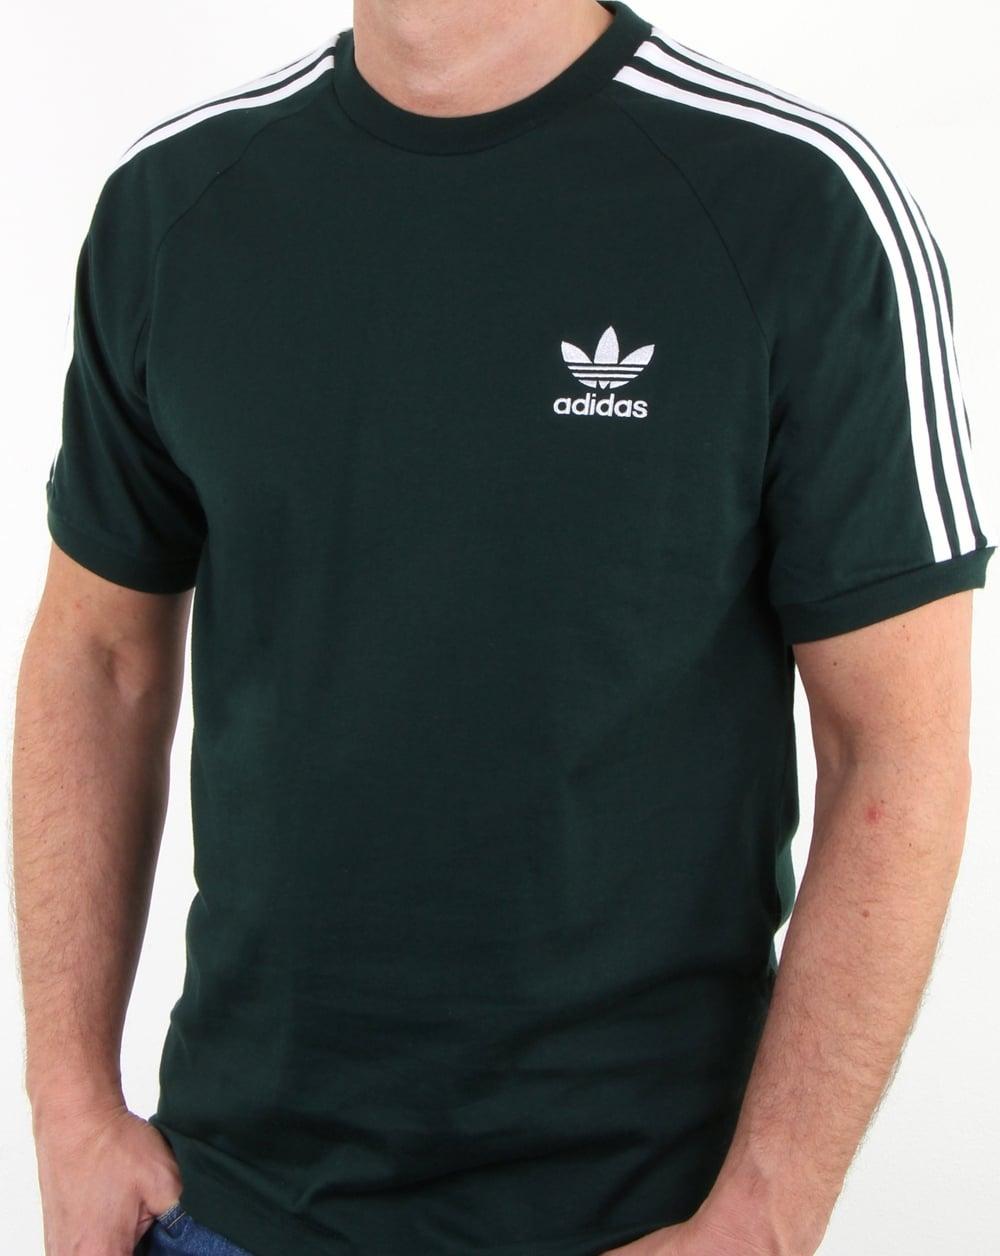 adidas originals 3 stripes t shirt green mens cotton